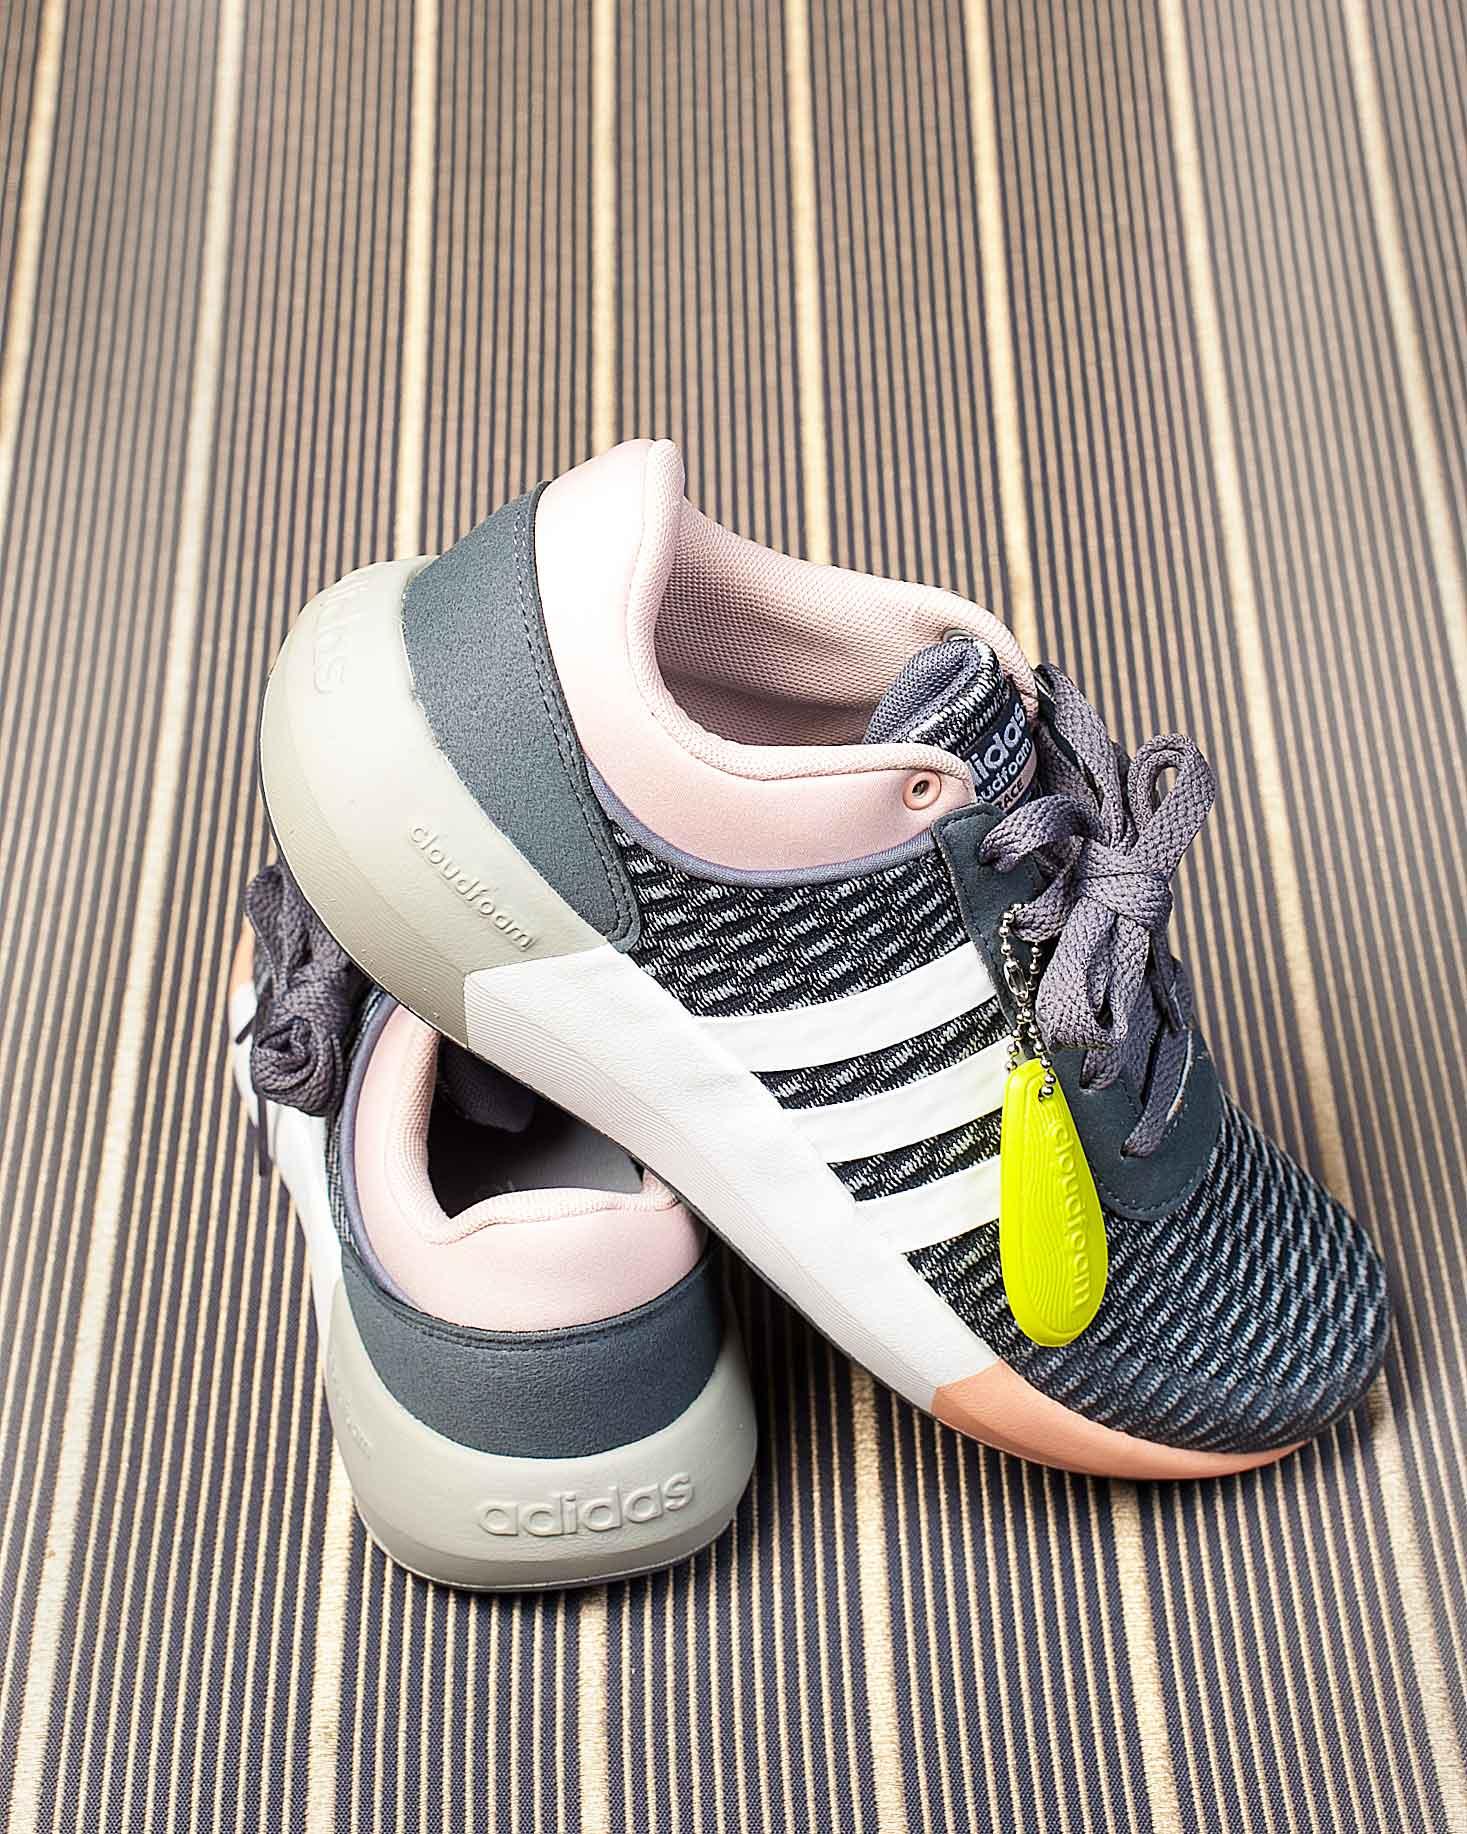 adidas sko herre 2016